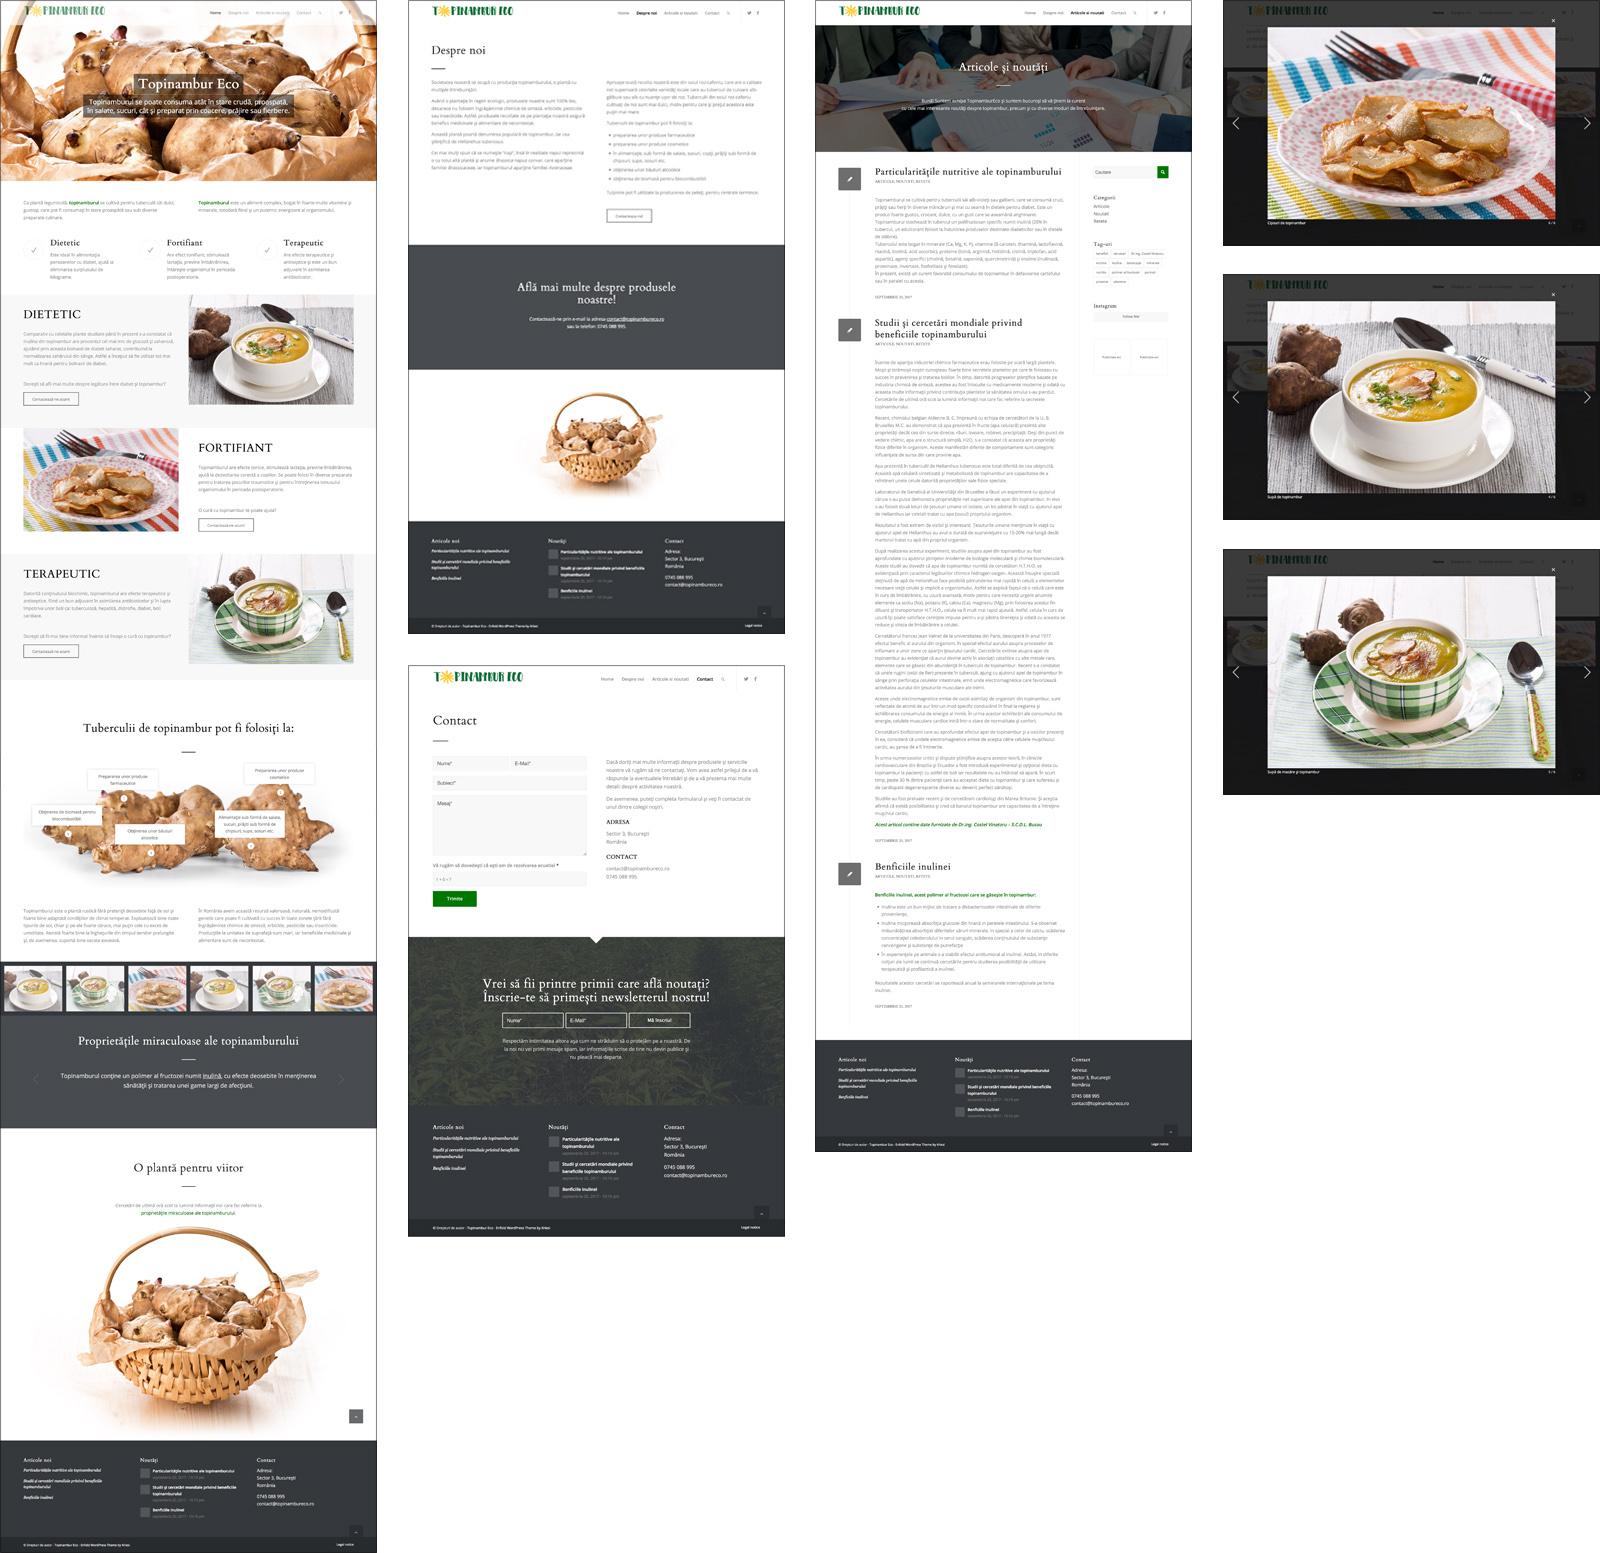 Topinambur Eco - web site